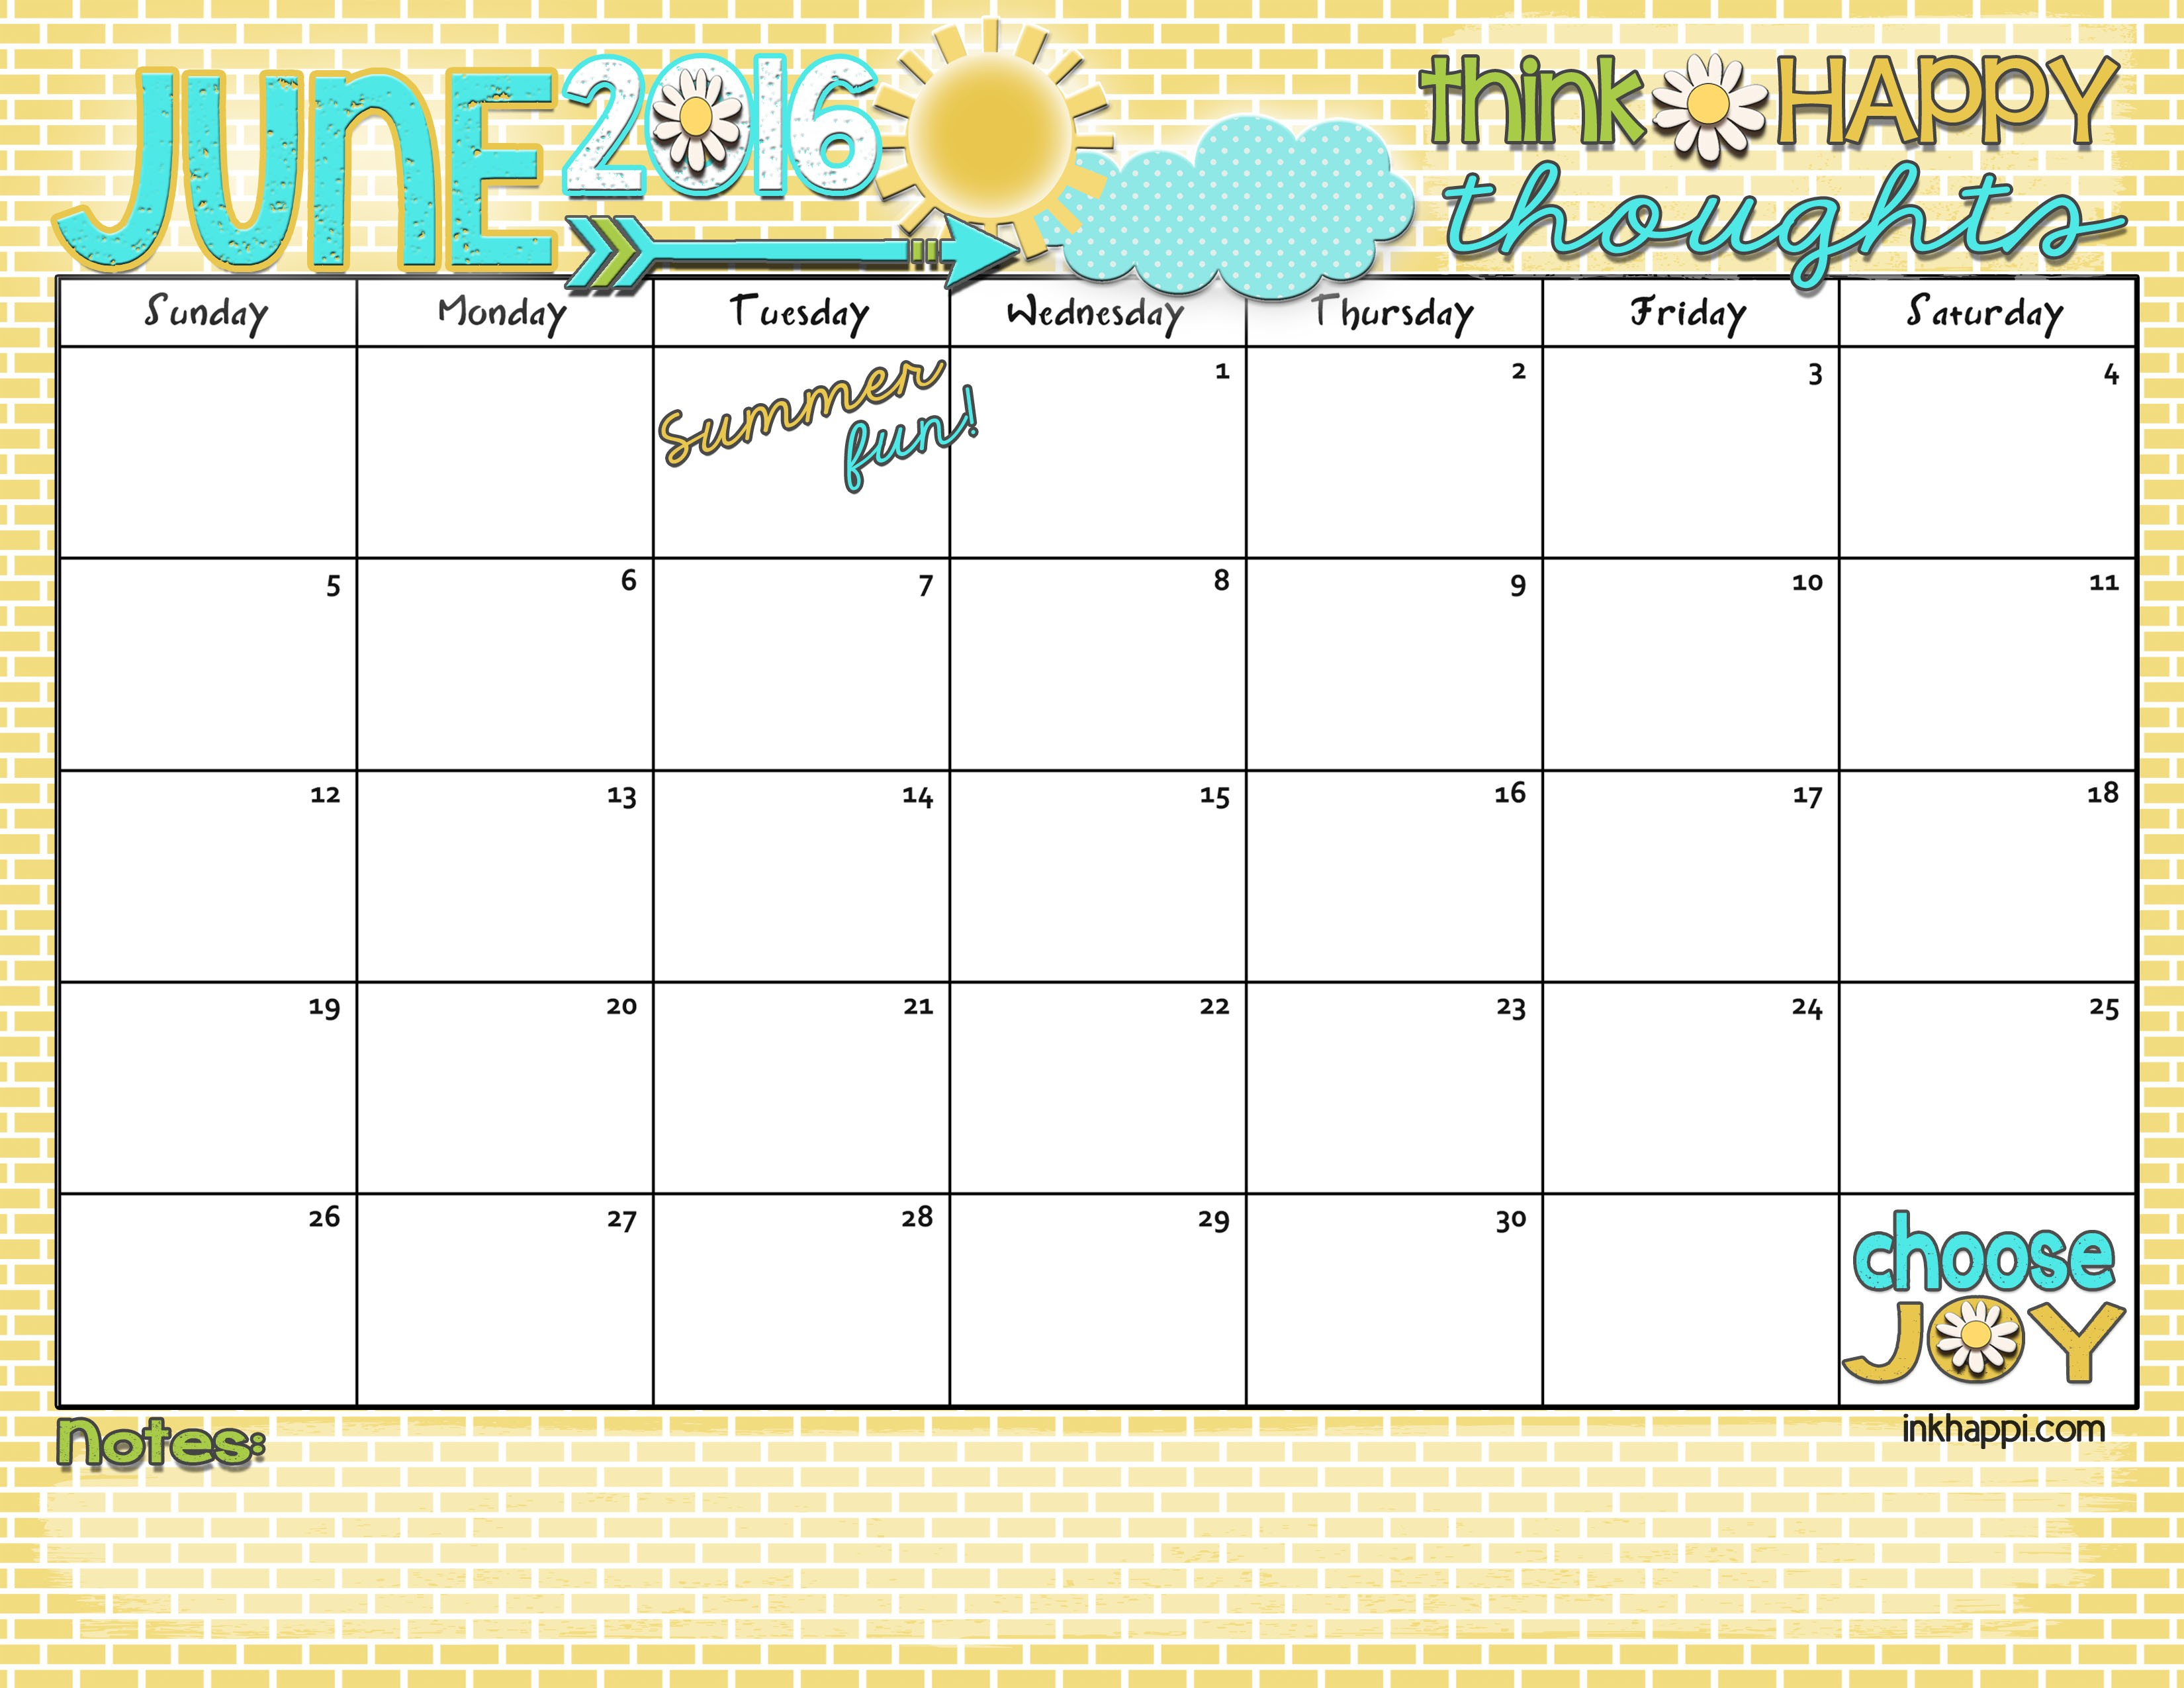 Printable June Calendar June 2016 Calendar Let S Have some Summer Fun Inkhappi